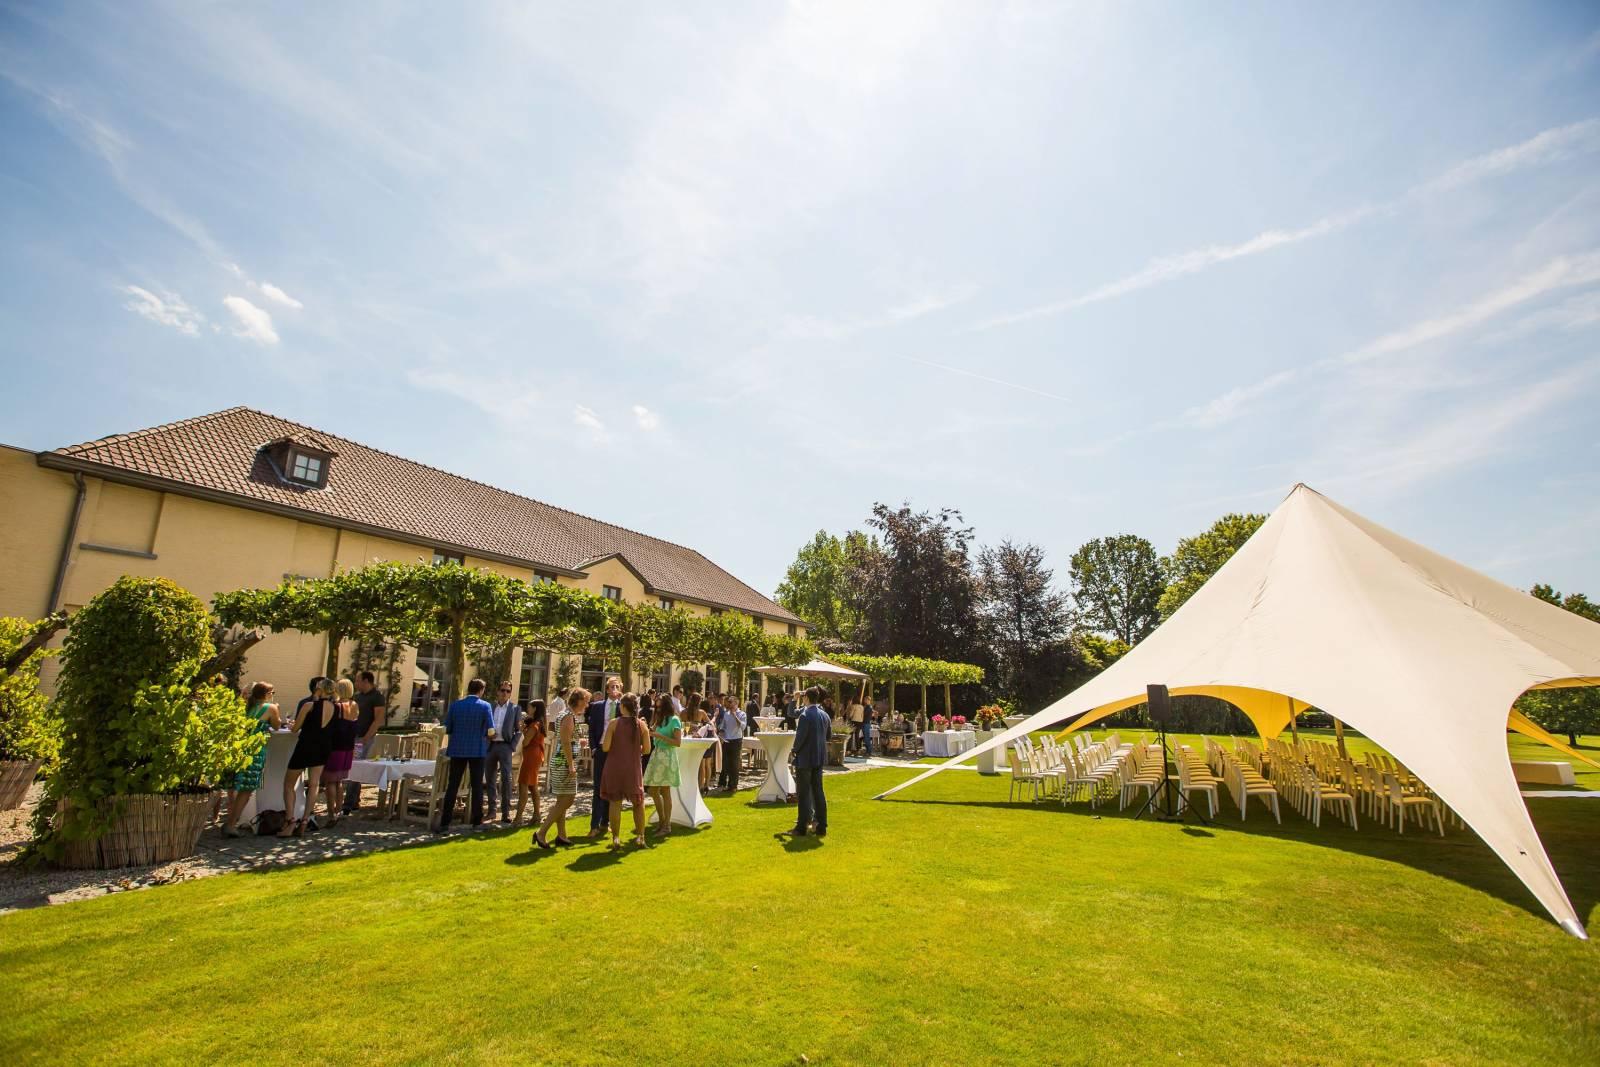 De Barrier - Feestzaal -  House of Weddings - 12